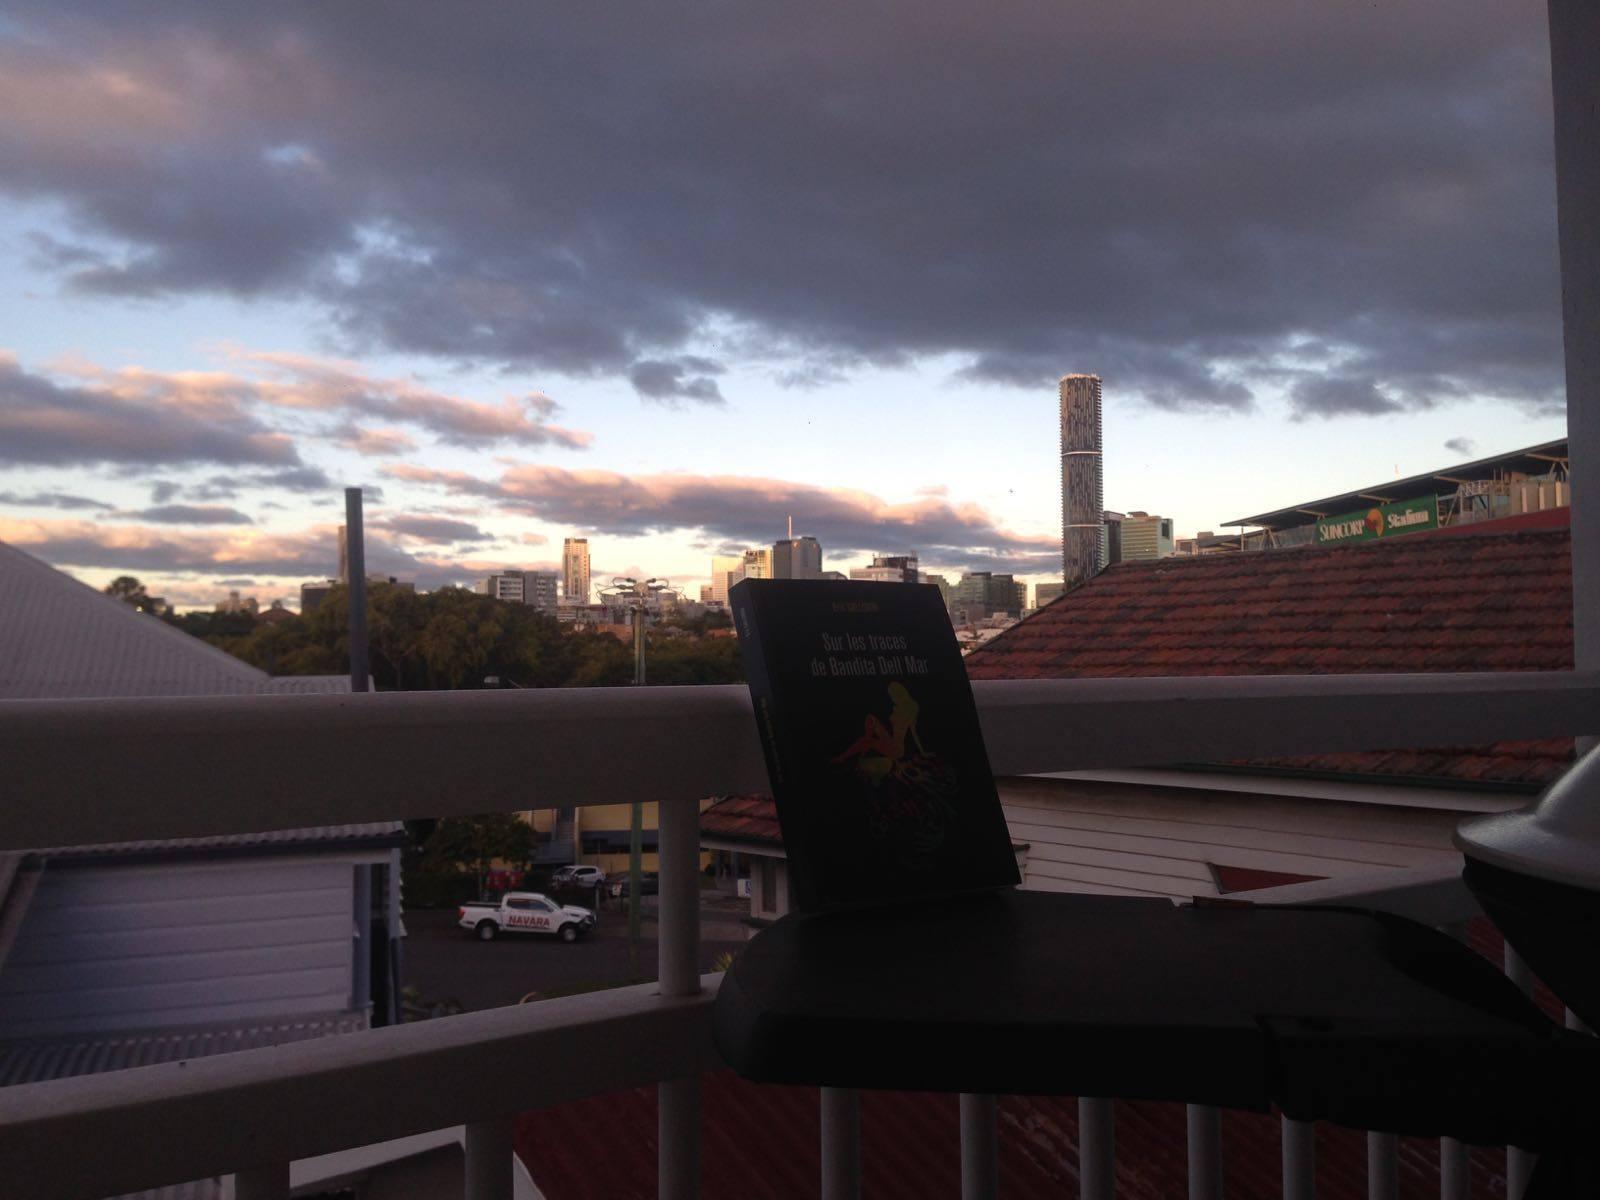 Bandita, à Brisbane, Australie, au petit matin. Jean-Baptiste.